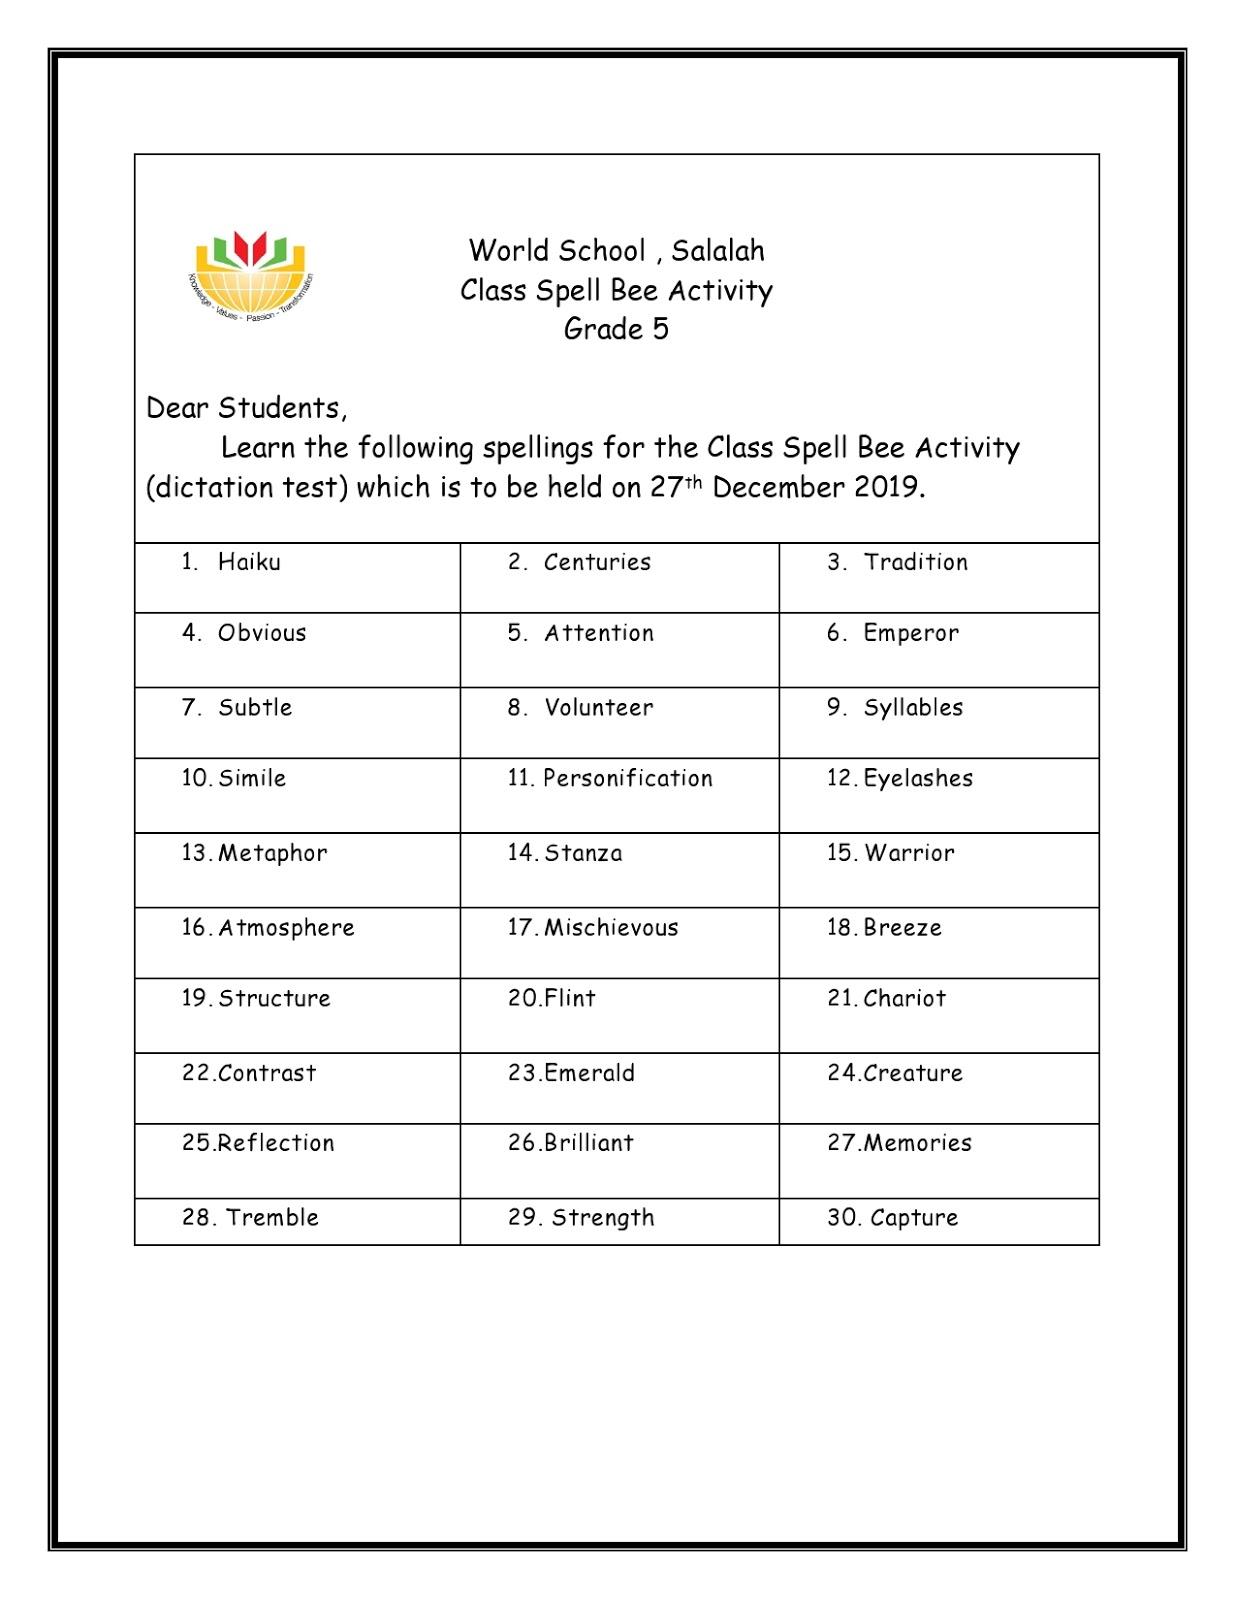 Birla World School Oman Homework For Grade 5 As On 8 12